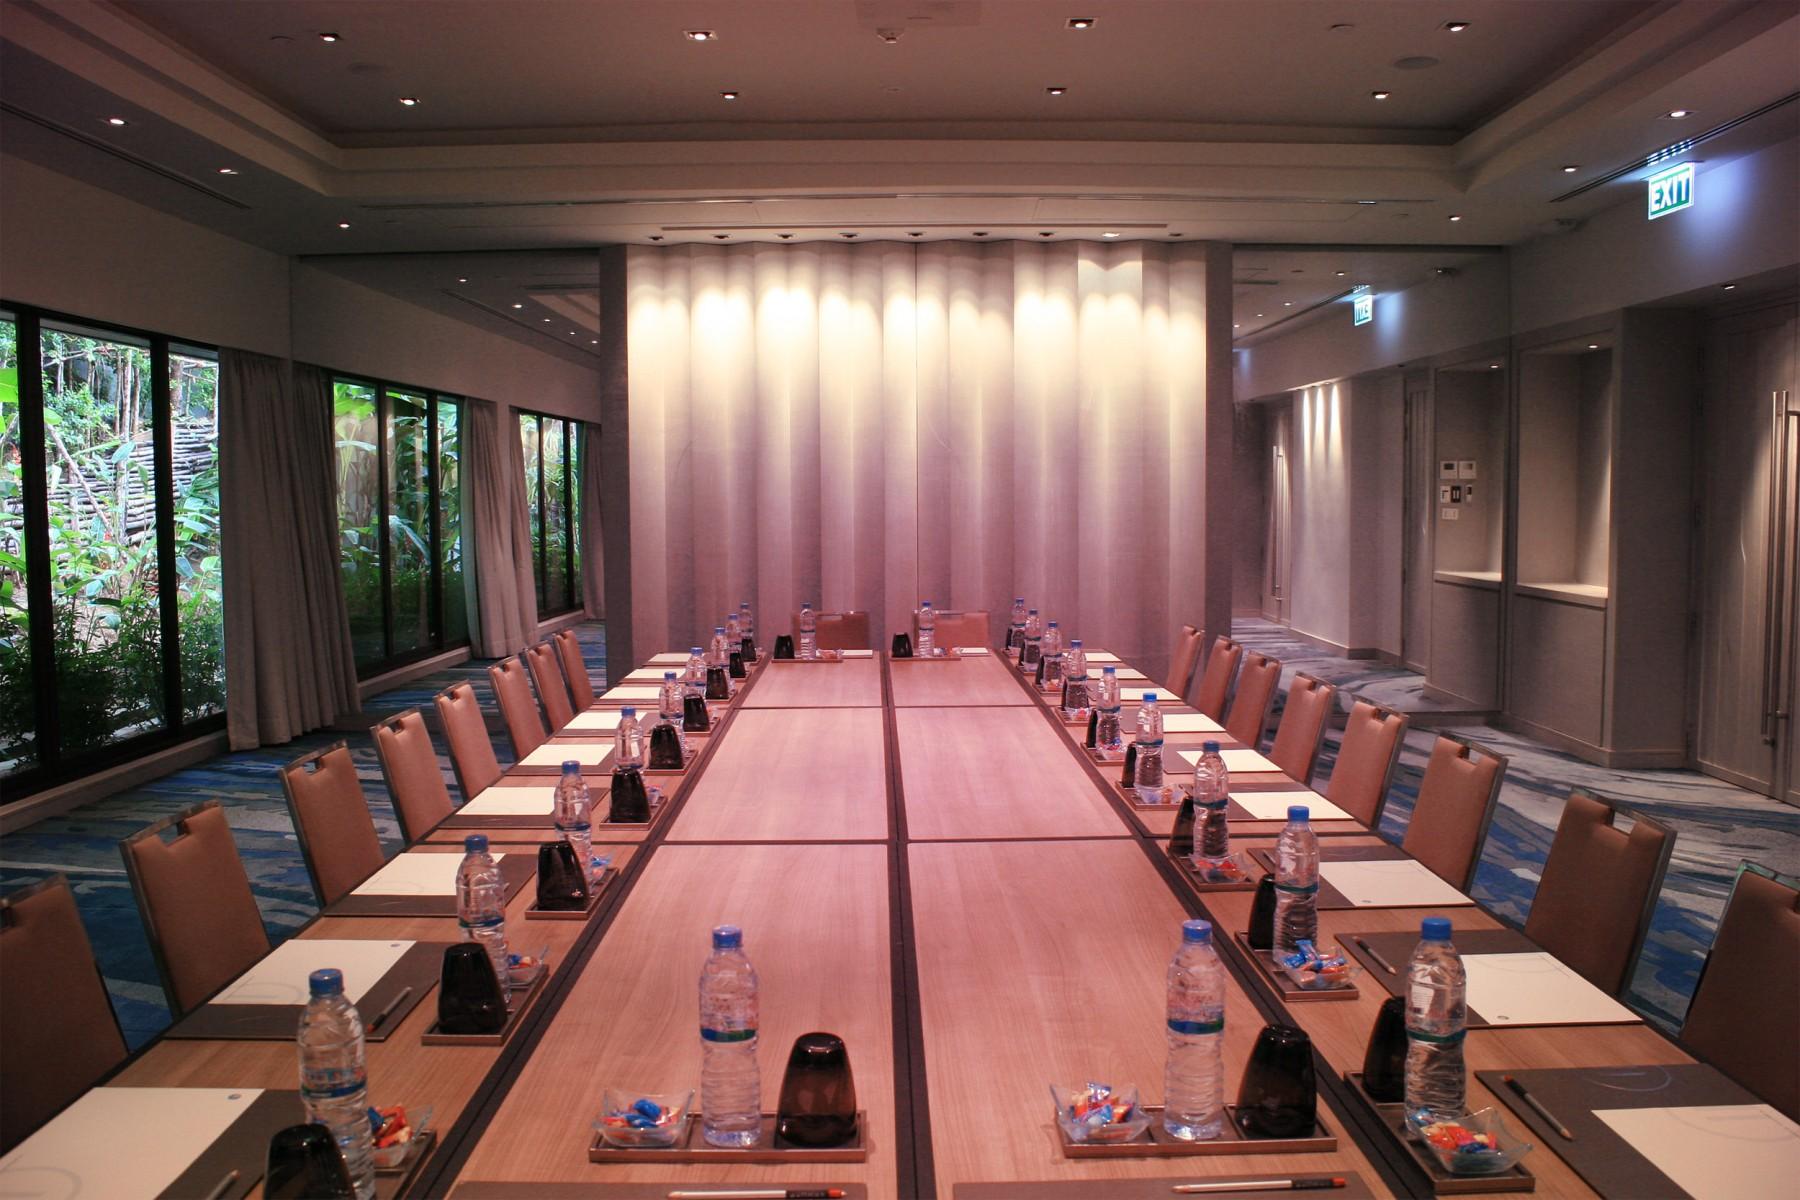 meetings-and-events-meeting-in-phuket-Arcadia-Ballroom-01-resized1.jpg